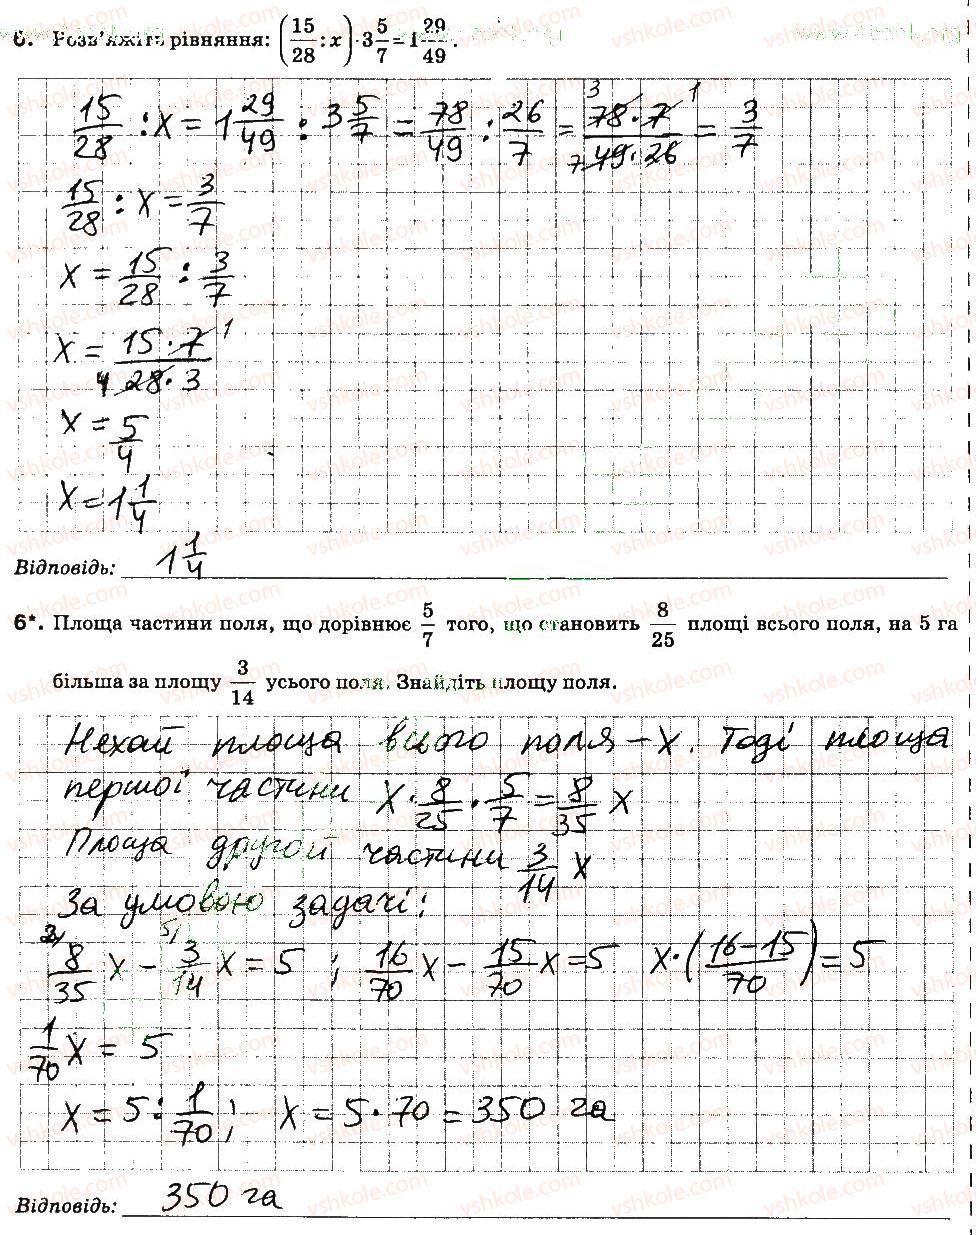 6-matematika-na-tarasenkova-im-bogatirova-om-kolomiyets-zo-serdyuk-2014-zoshit--tematichni-kontrolni-roboti-kontrolna-robota-3-В1-rnd2953.jpg